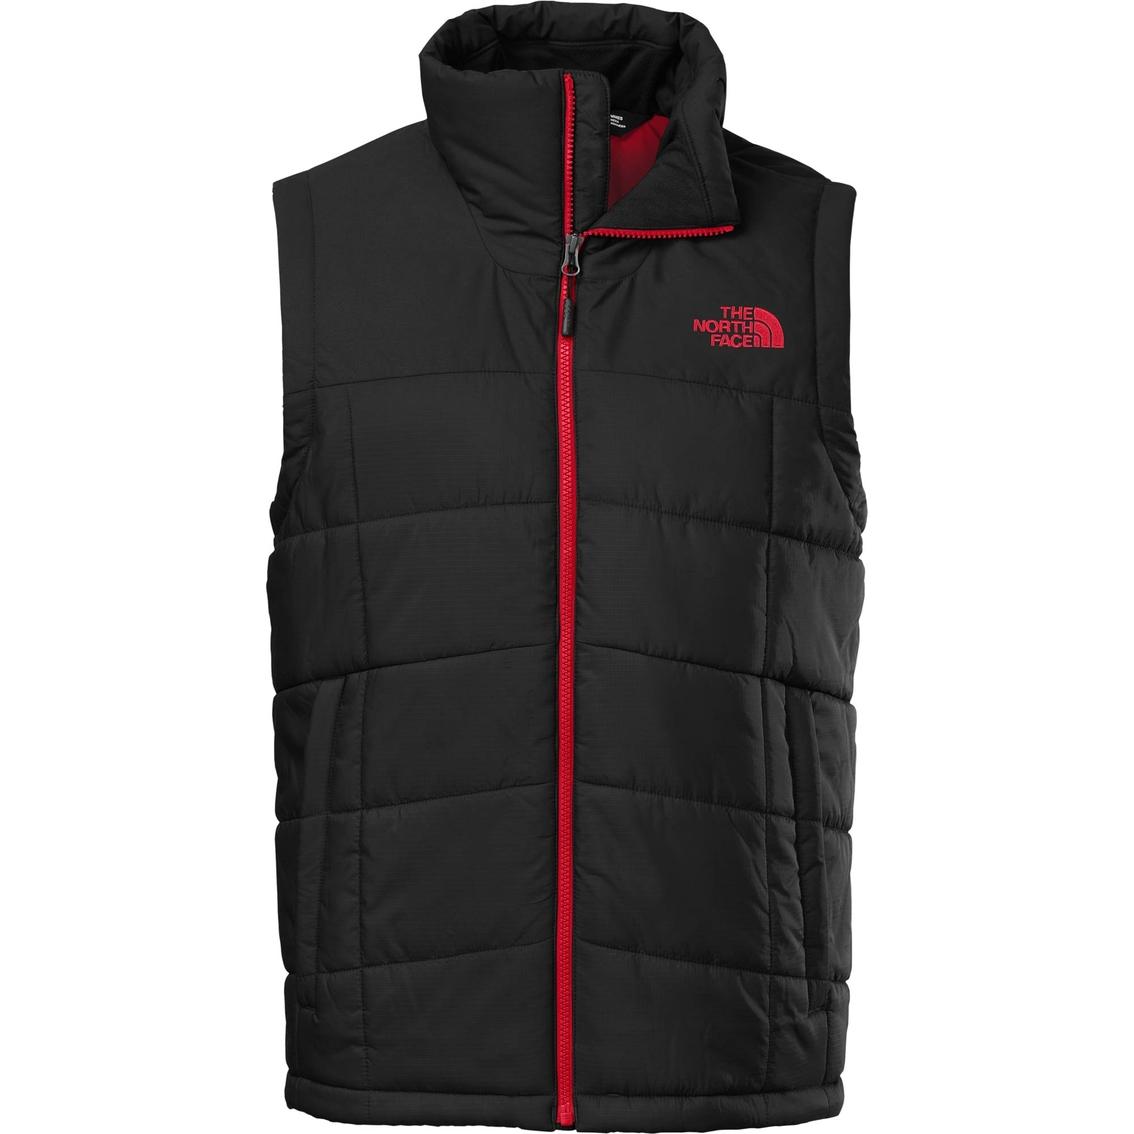 5ba286ffedea2 The North Face Roamer Vest | Vests | Apparel | Shop The Exchange